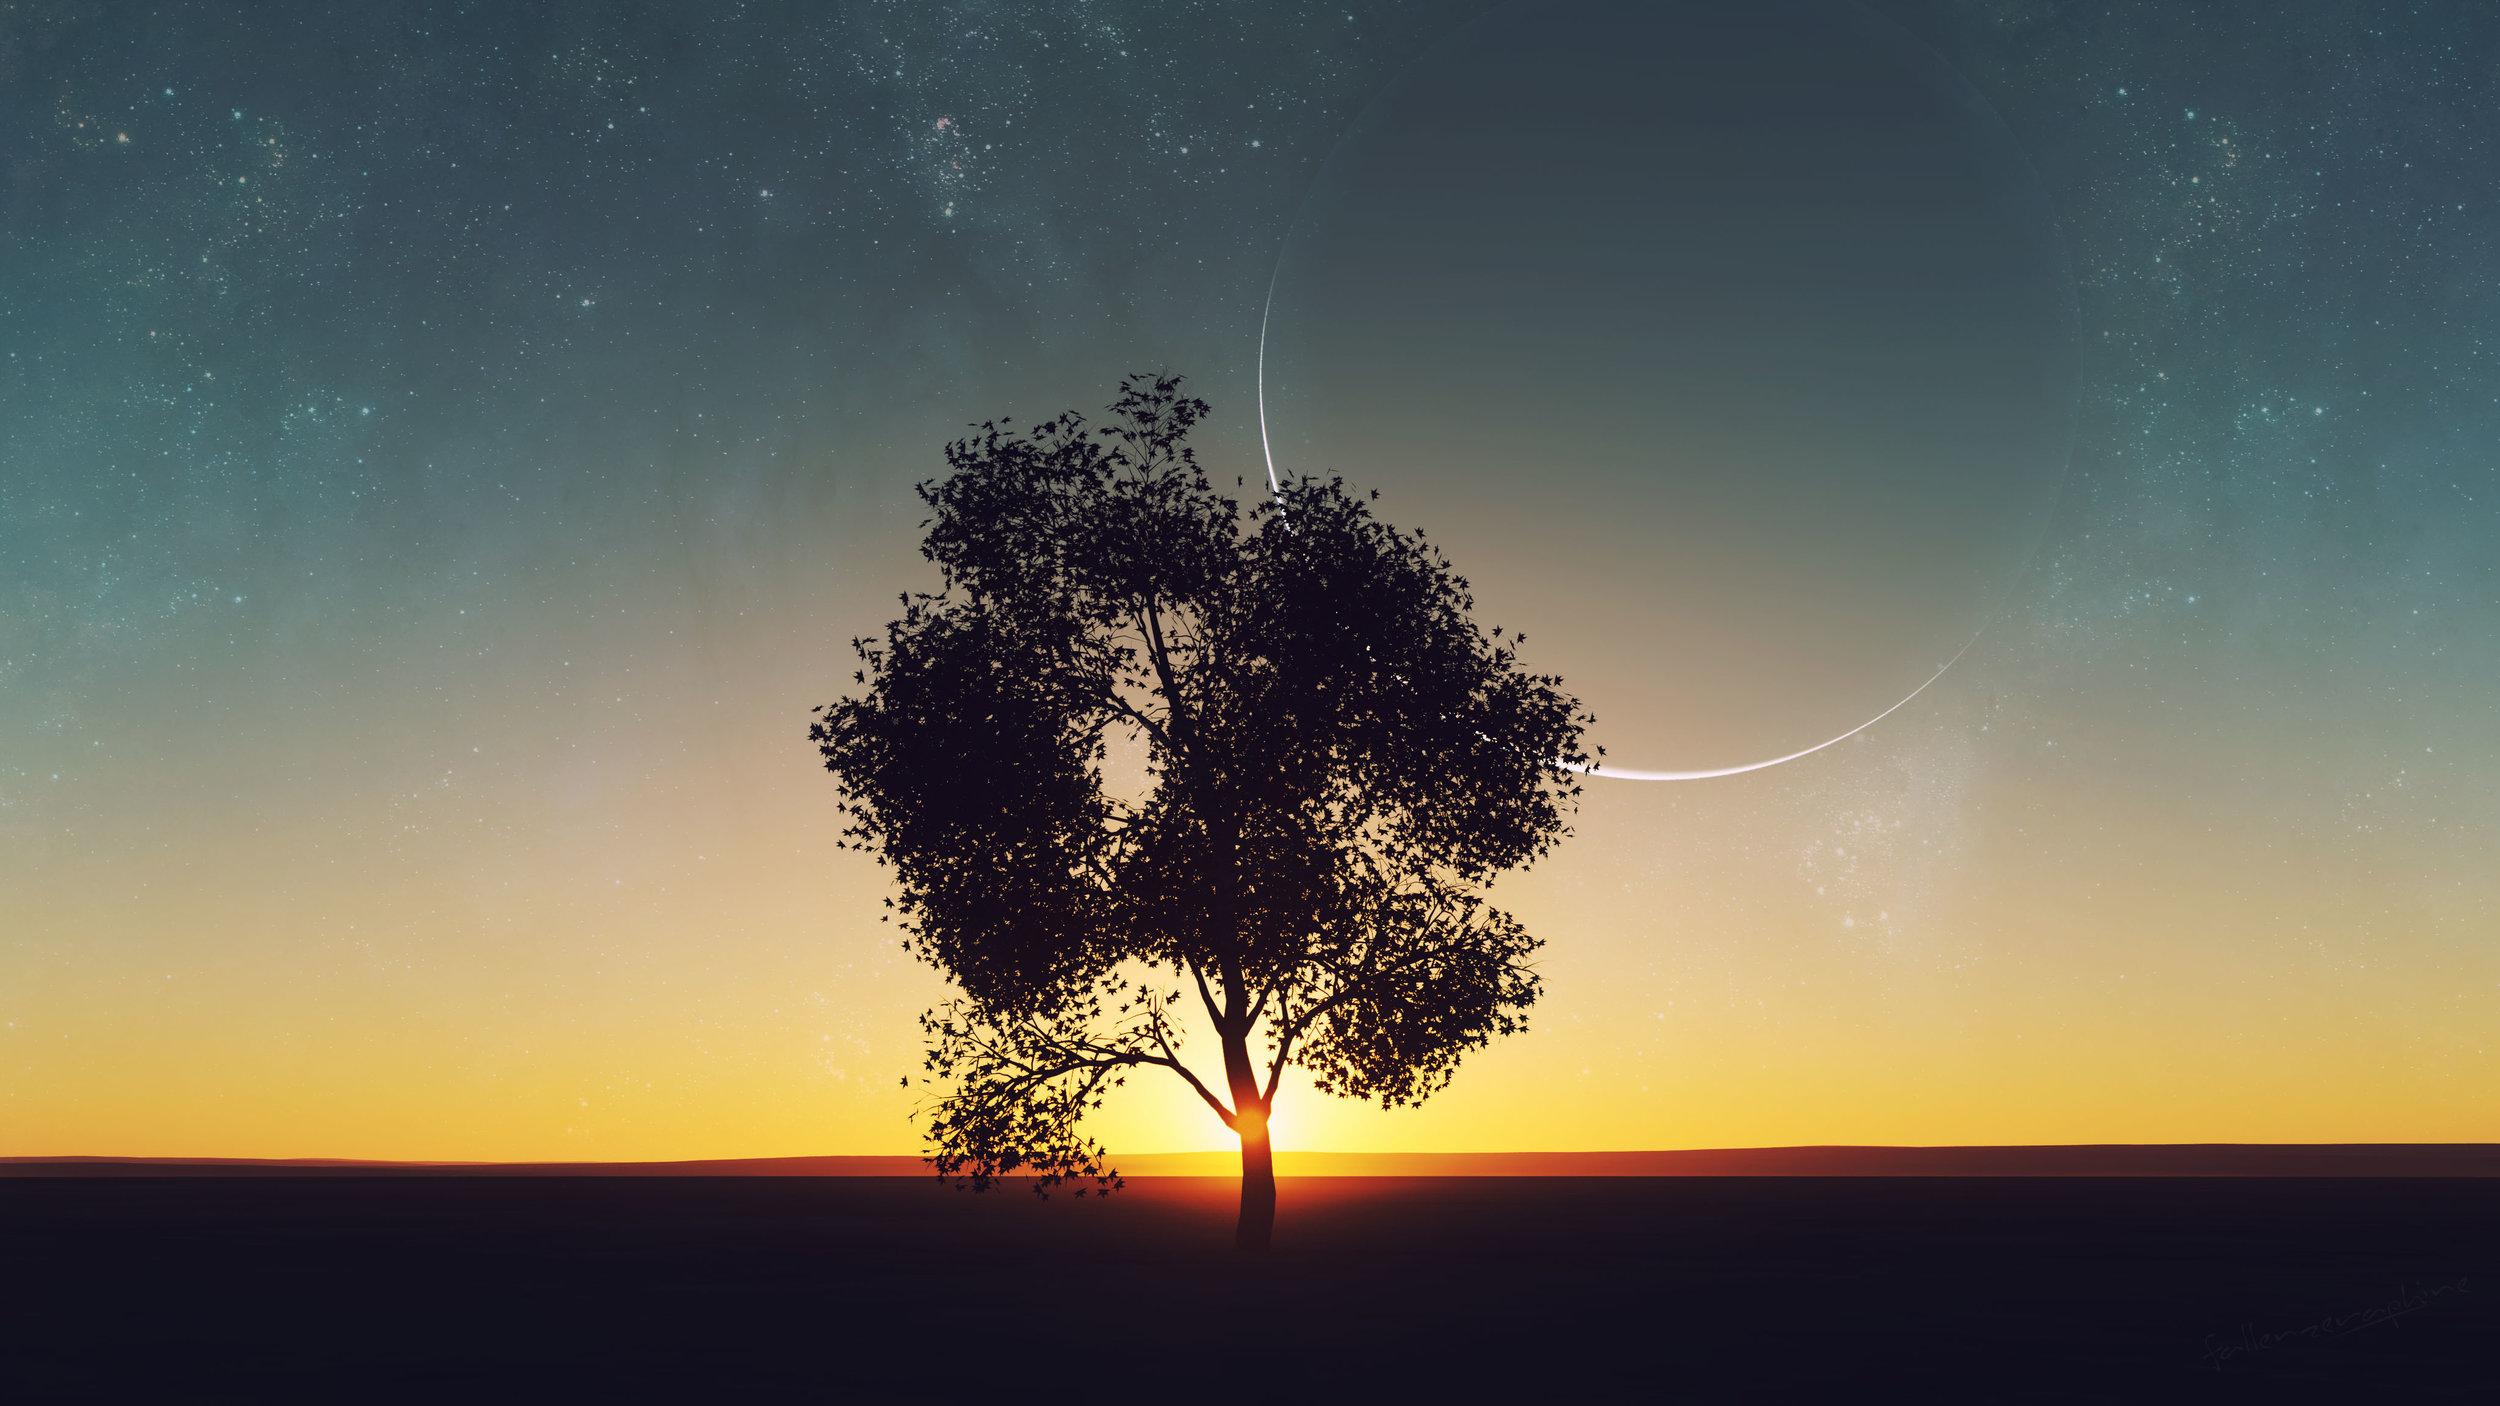 1277-the-tree-of-life-wimukthi-bandara